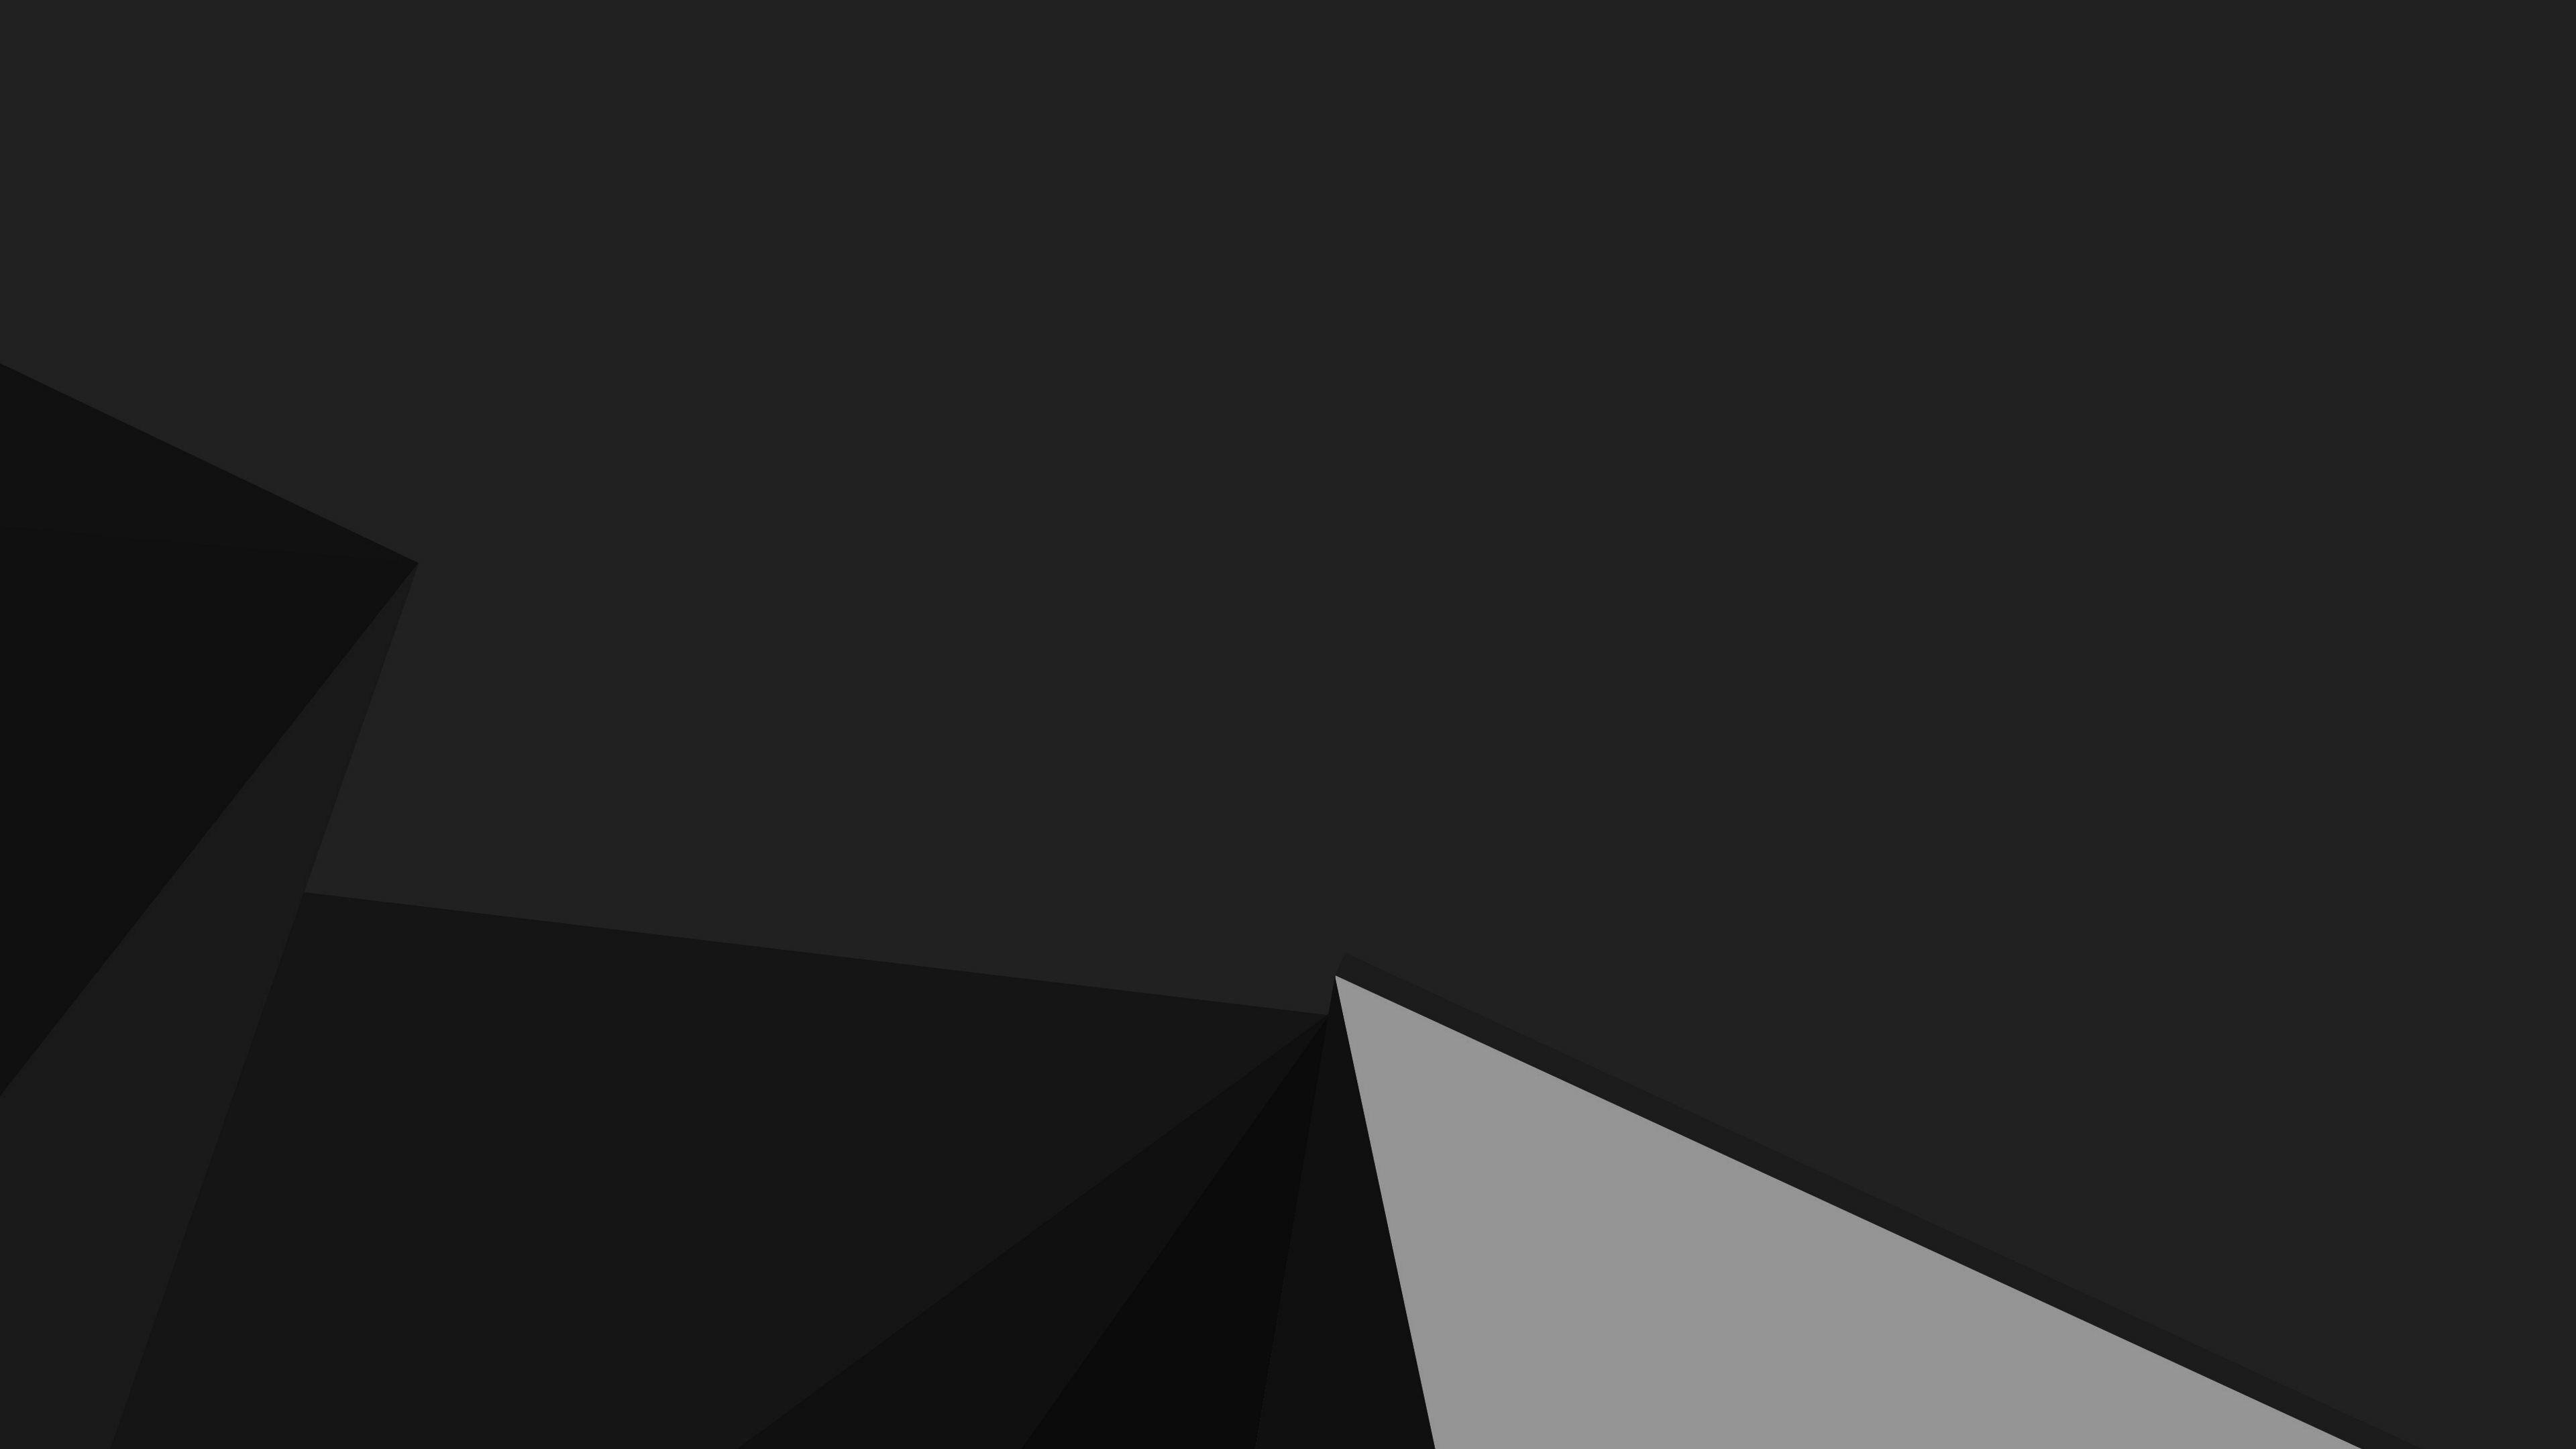 Free Download 3d Wallpapers For Windows 7 Desktop Black Windows Wallpapers Group 87